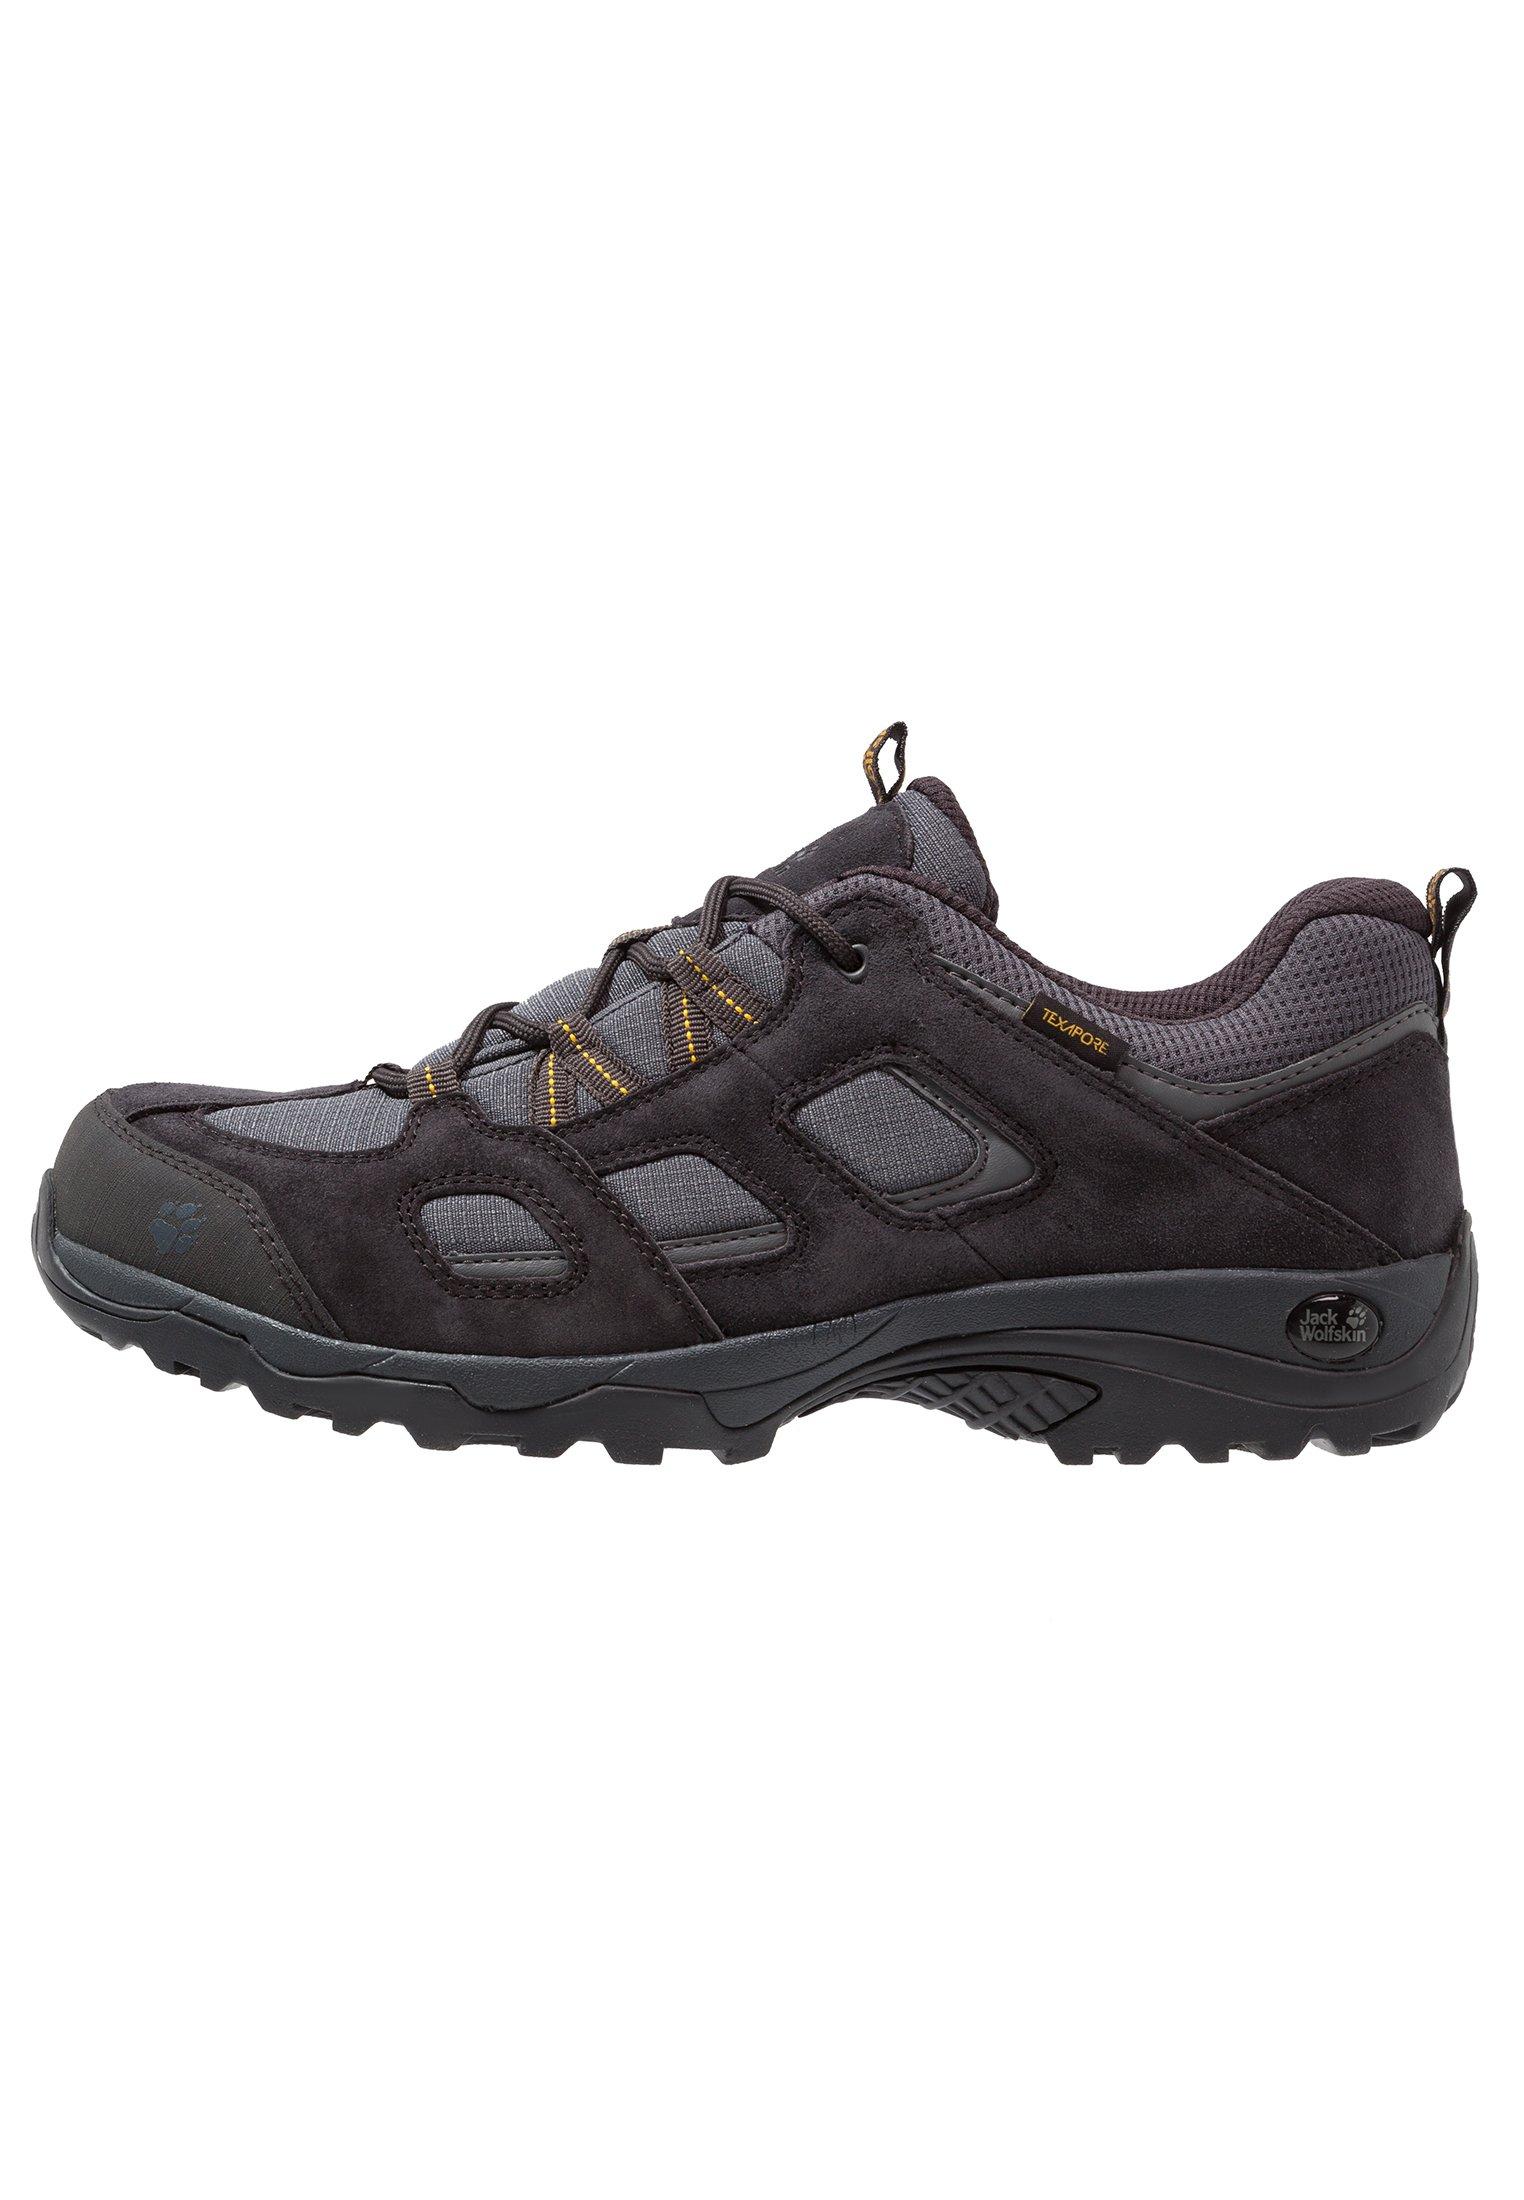 Jack Wolfskin VOJO HIKE 2 TEXAPORE LOW Chaussures de